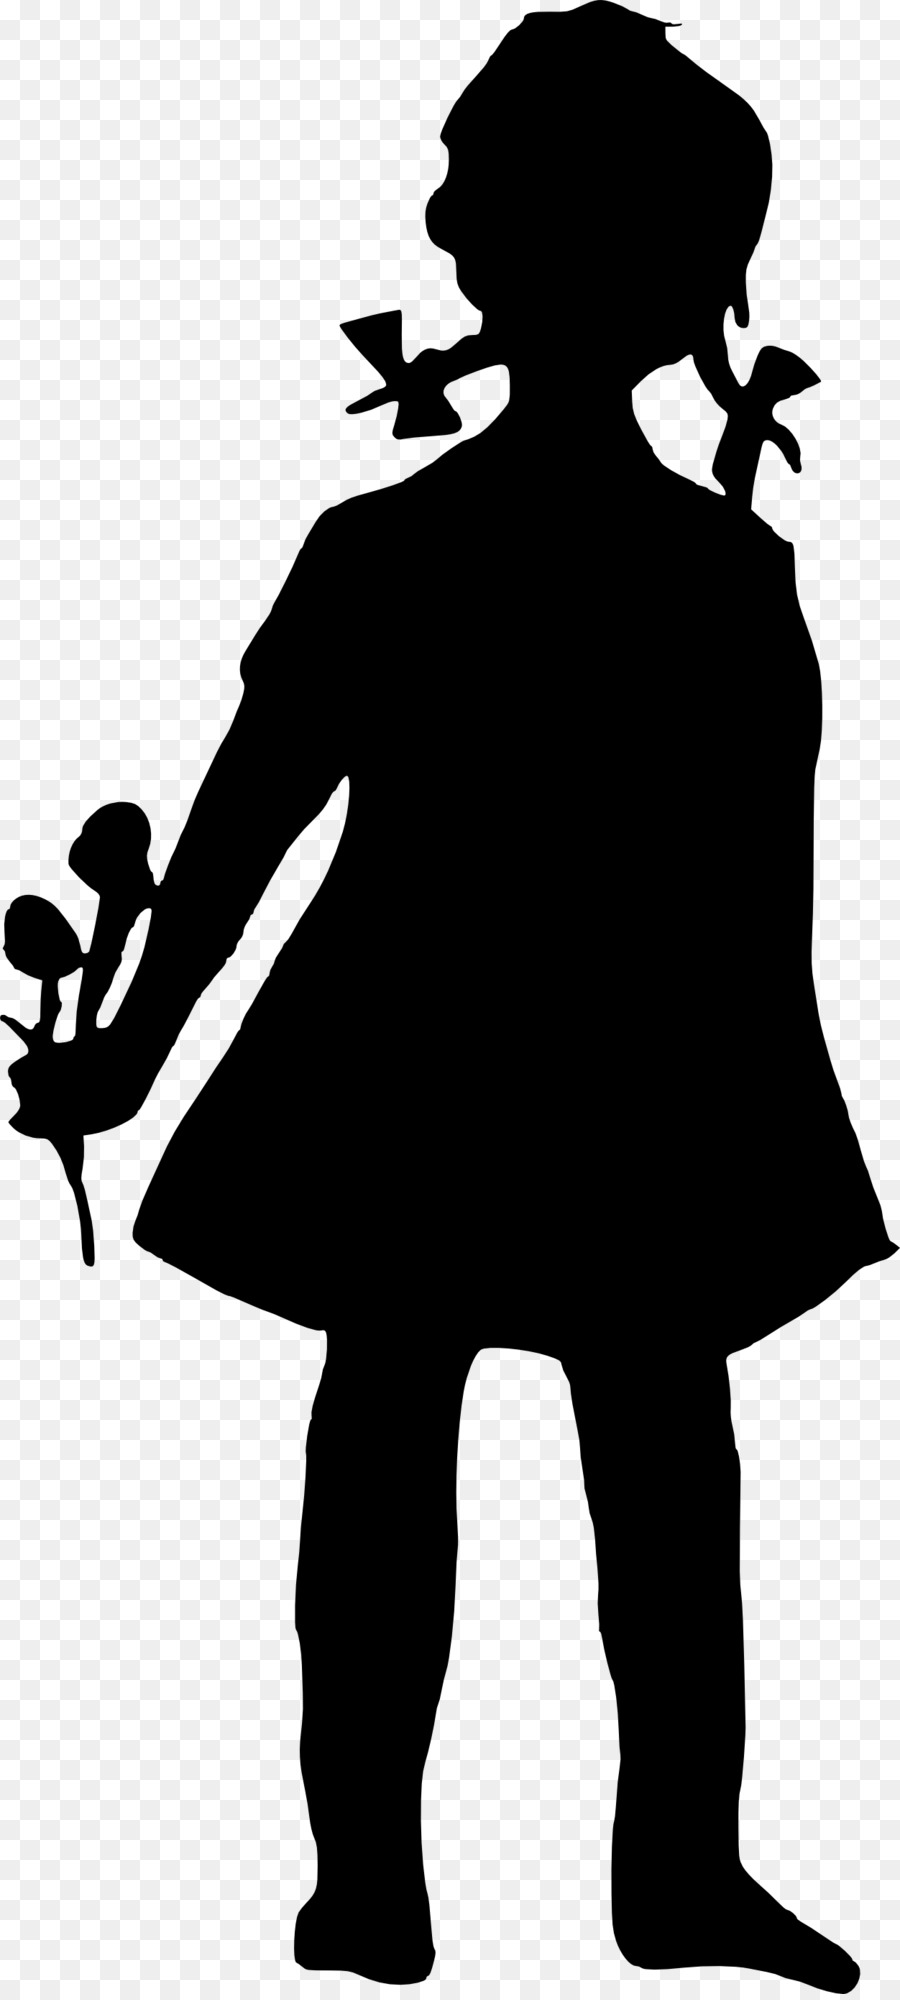 Free Little Girl Silhouette Clip Art, Download Free Clip Art.